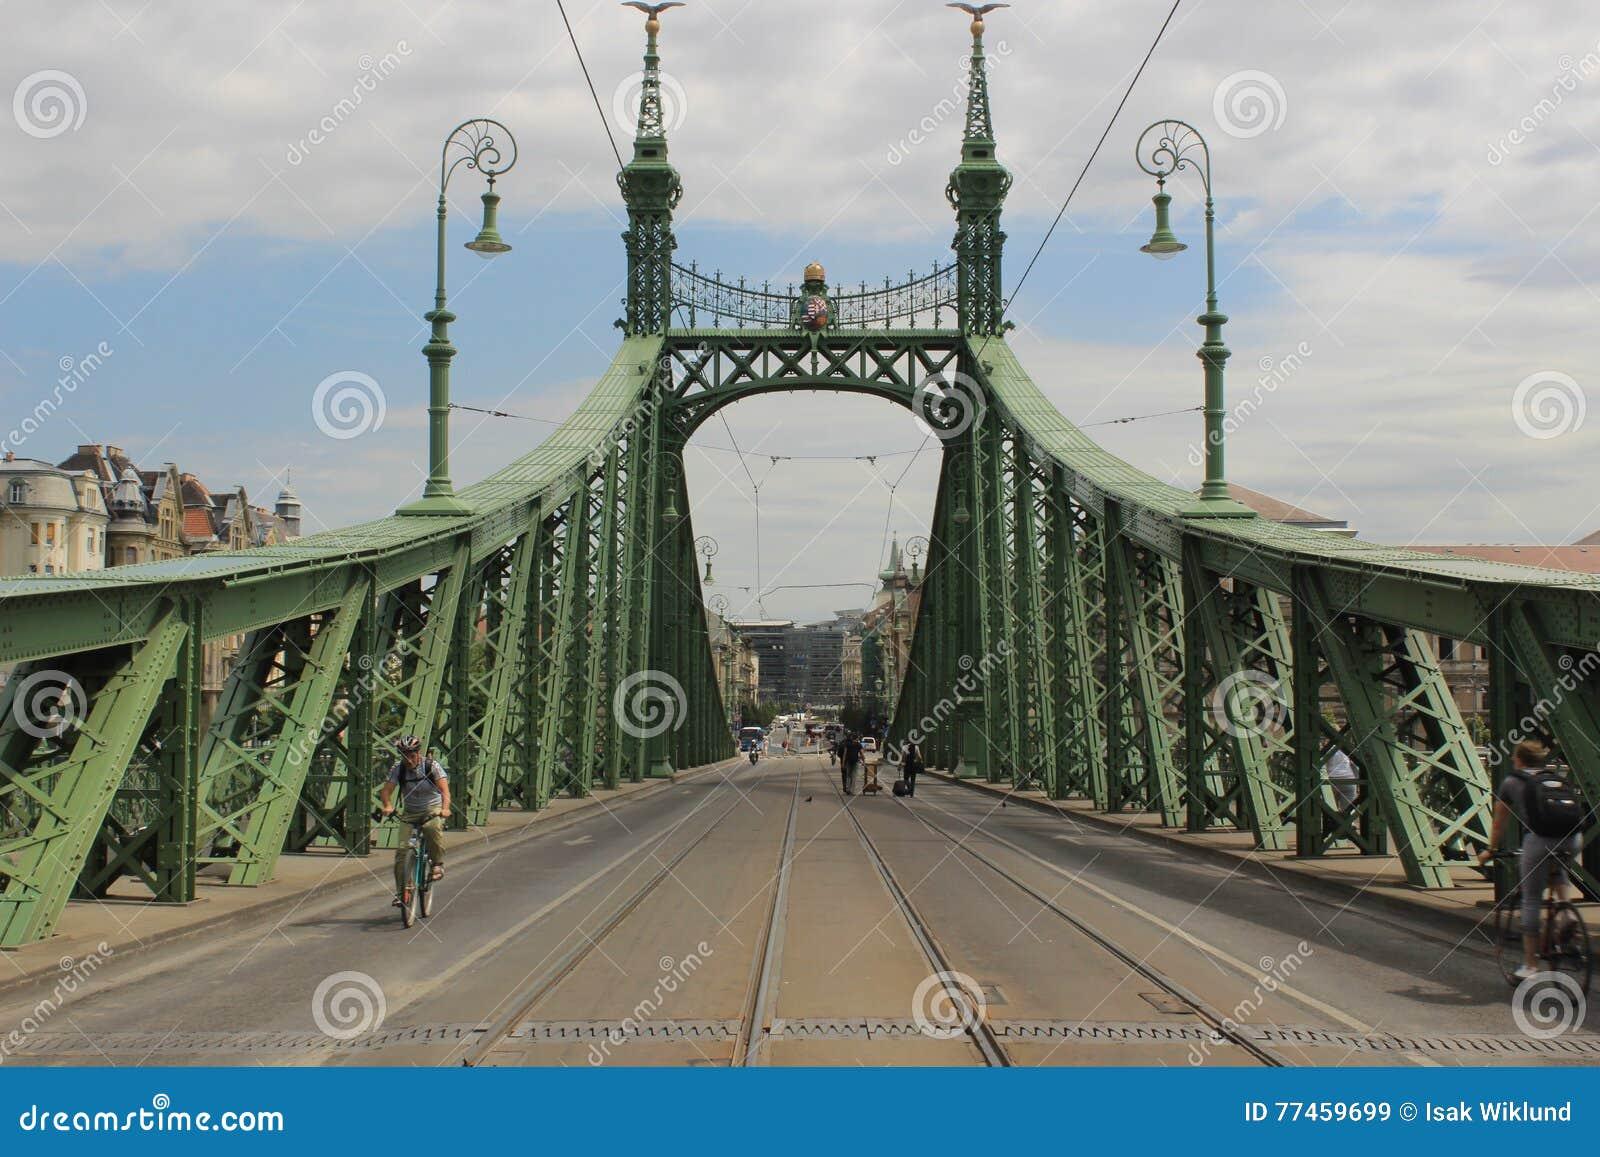 Urban plan Budapest Hungary